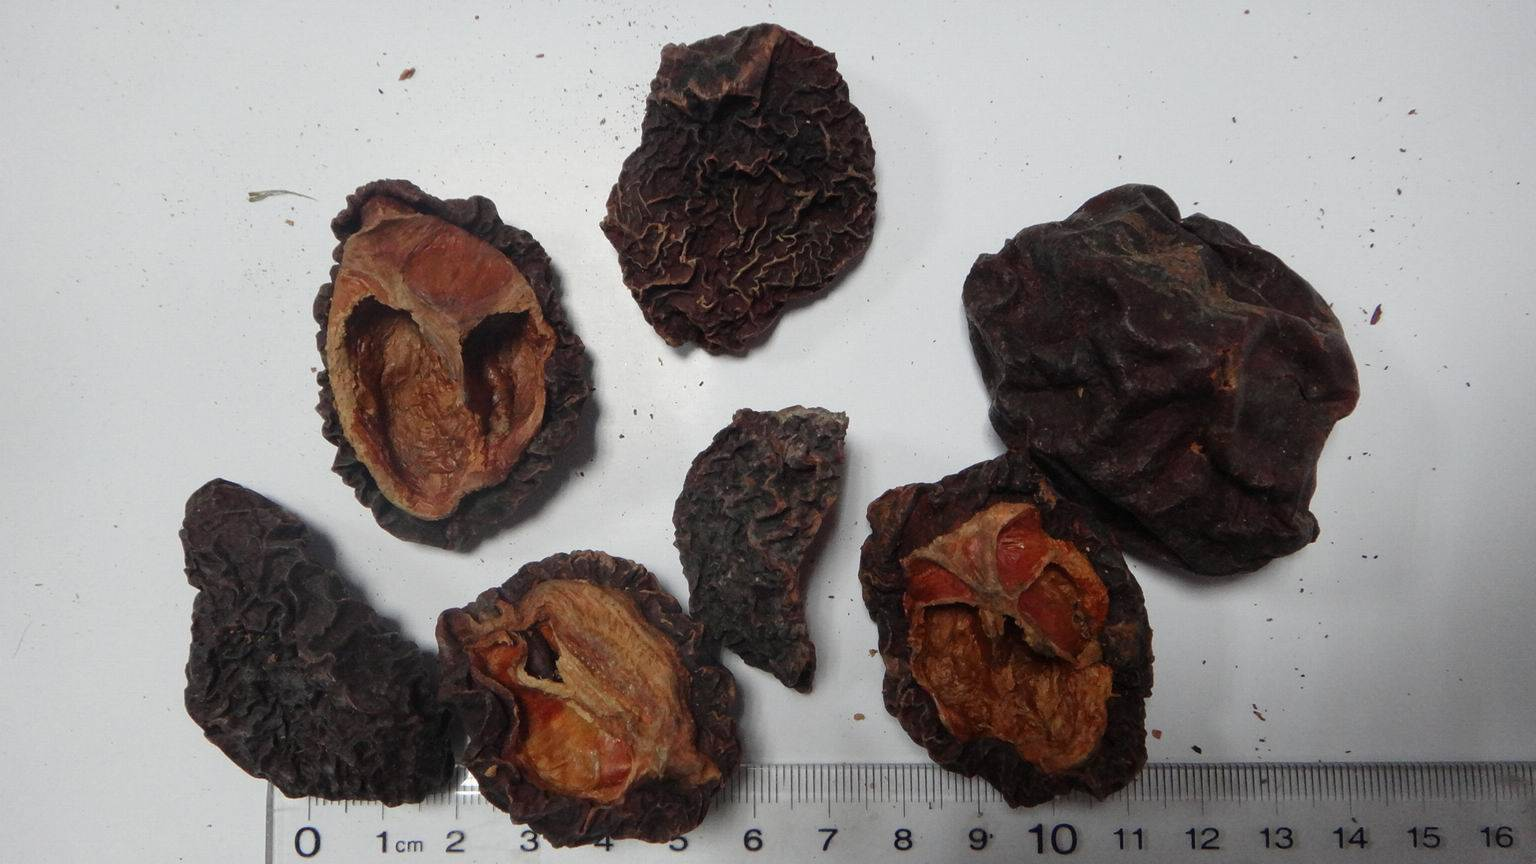 Chaneomeles,Flowering quince,Chaenomeles lagenaria